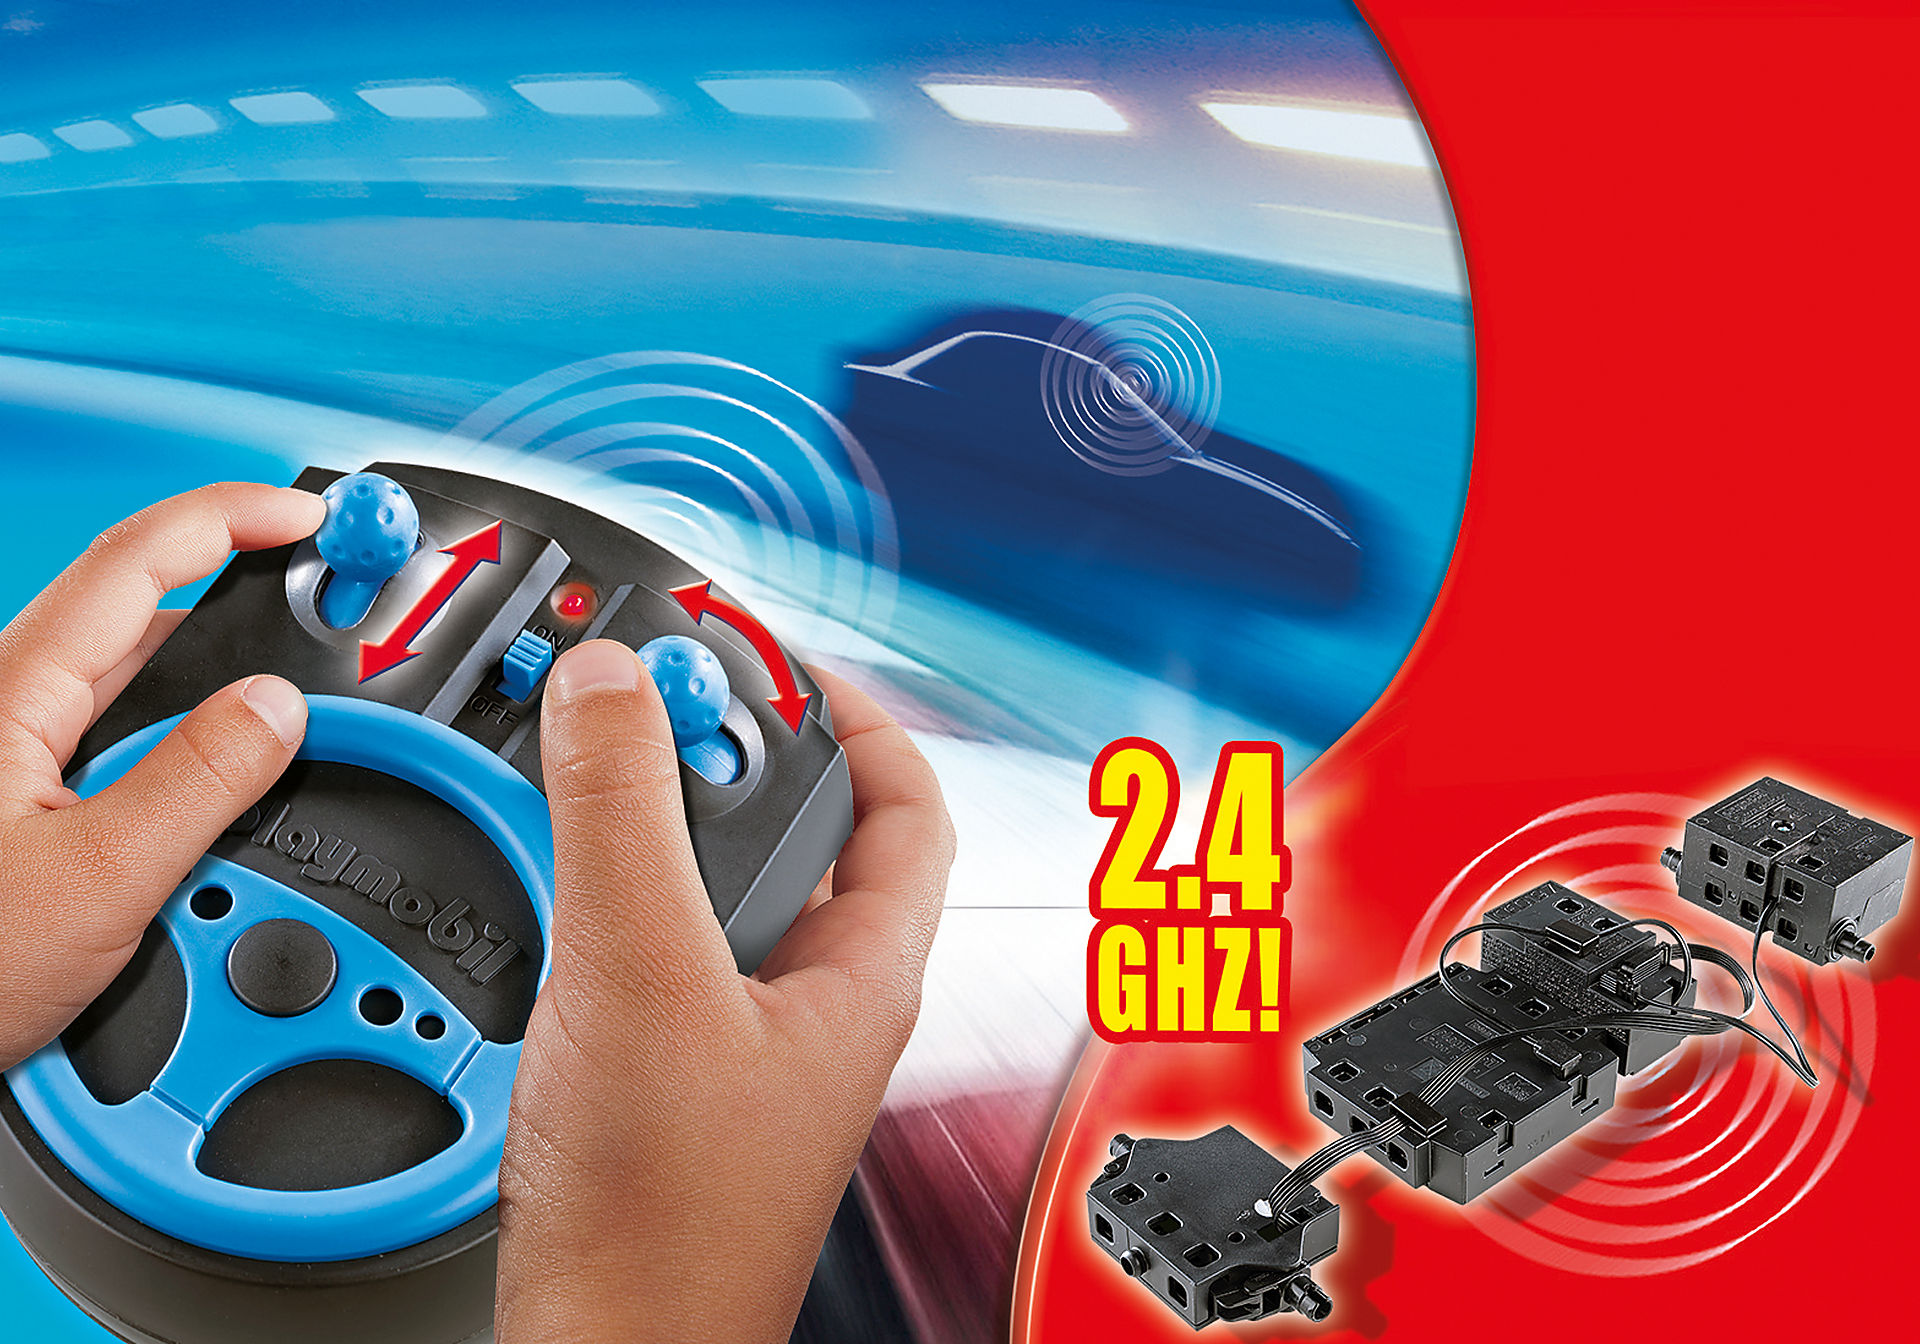 http://media.playmobil.com/i/playmobil/6914_product_detail/Fjärrkontrollset 2,4 GHz